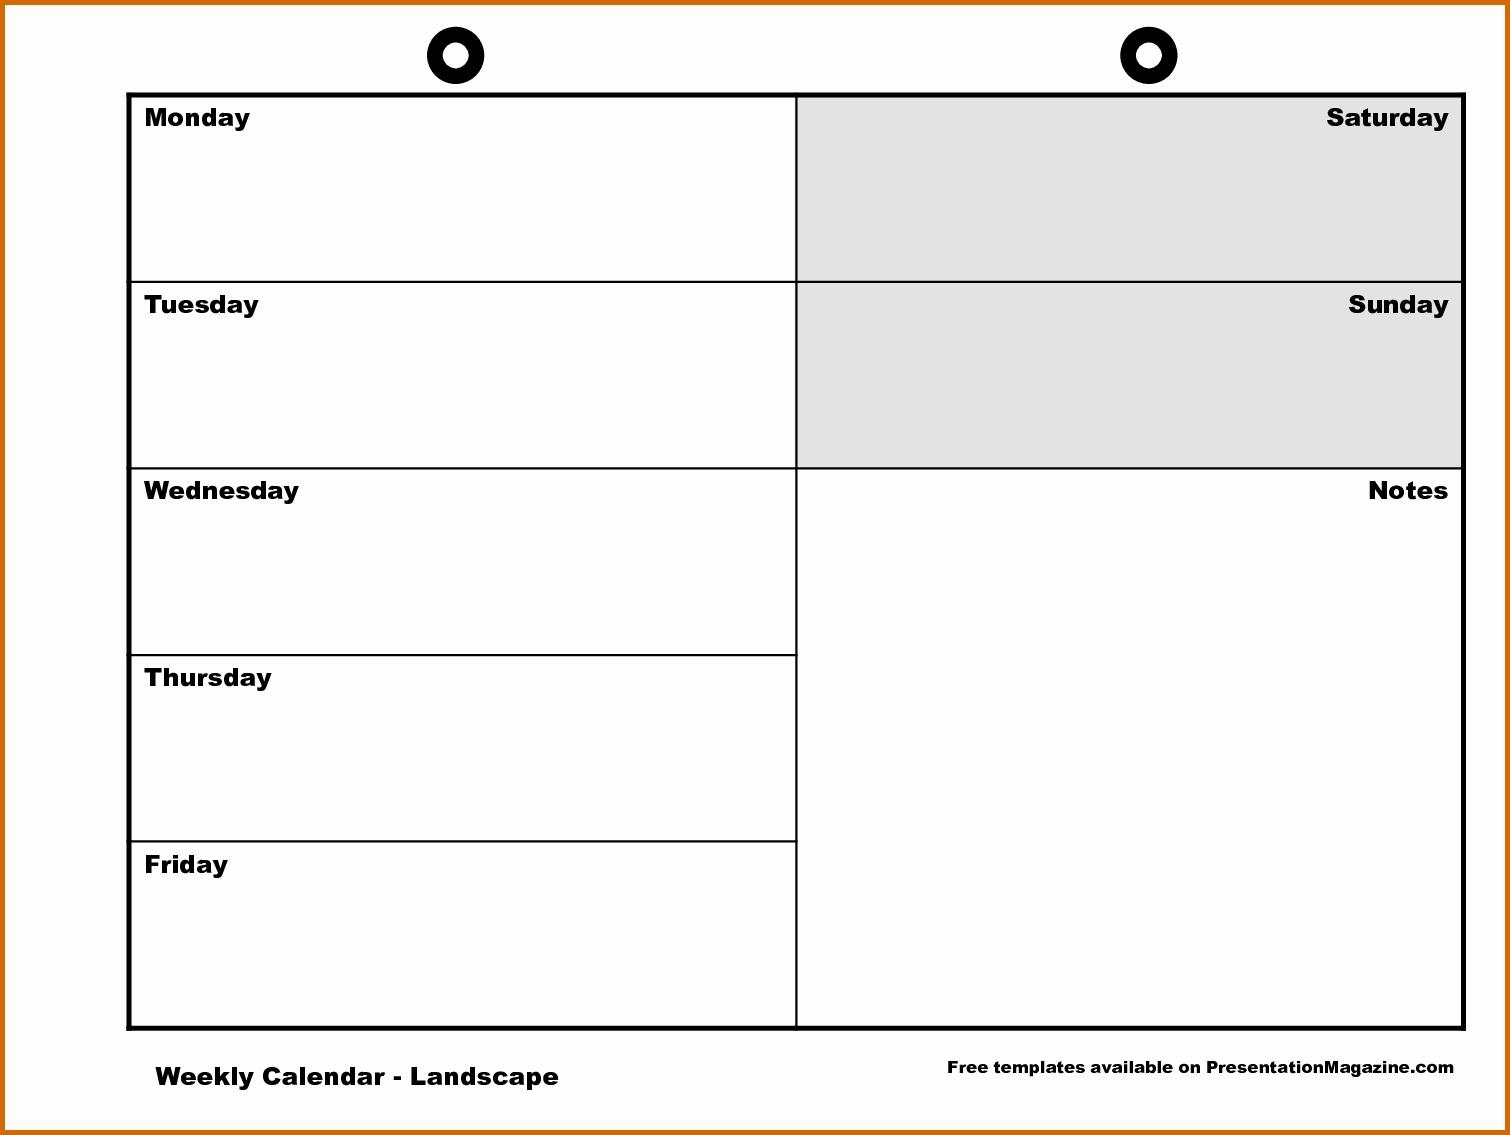 Free Printable 5 Day Weekly Calendar 11 Monday Through Friday with regard to Monday Through Friday Weekly Calendar